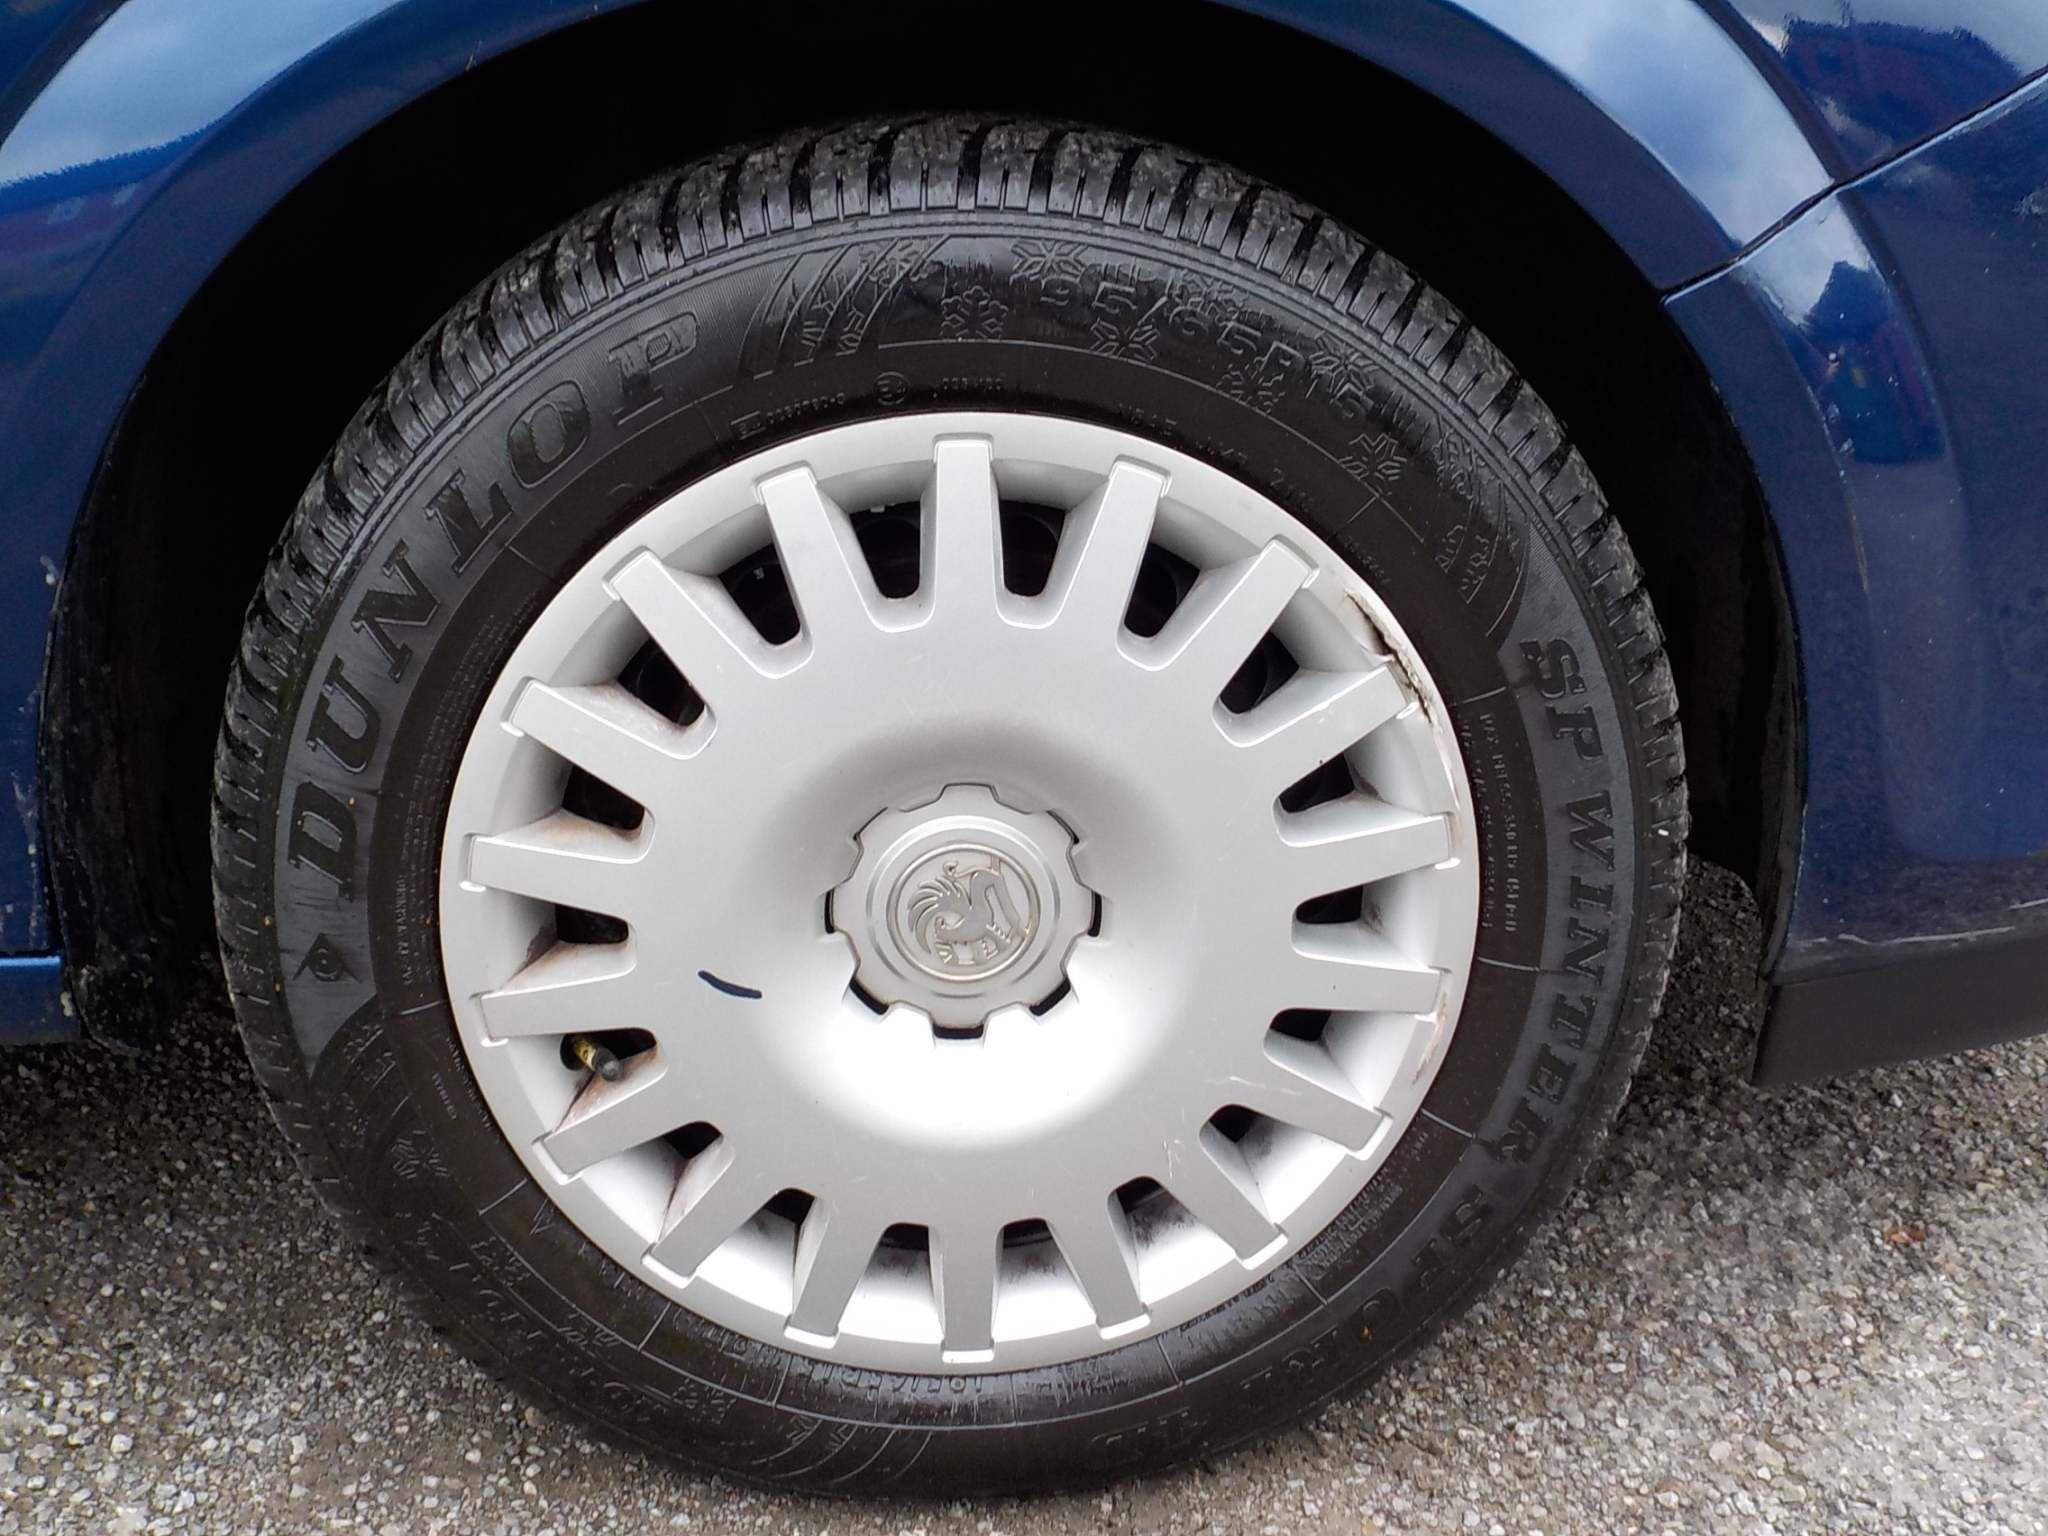 Vauxhall Astra 1.6 i 16v Life 5dr